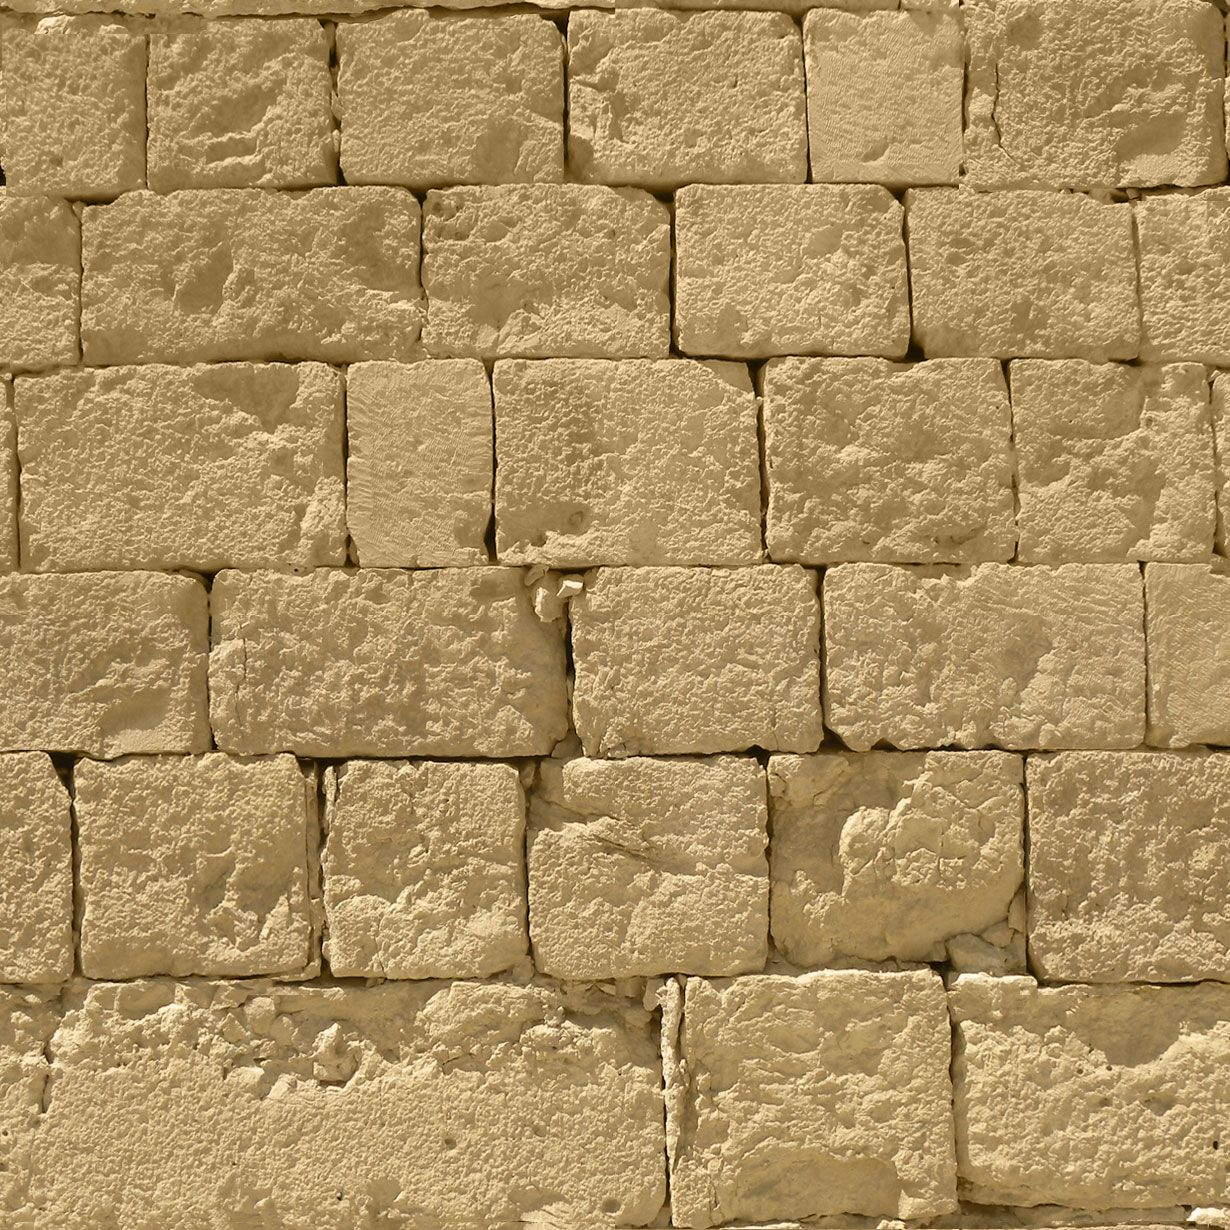 Stone Wall Seamless Texture | Stuff to Buy | Pinterest | Seamless ...